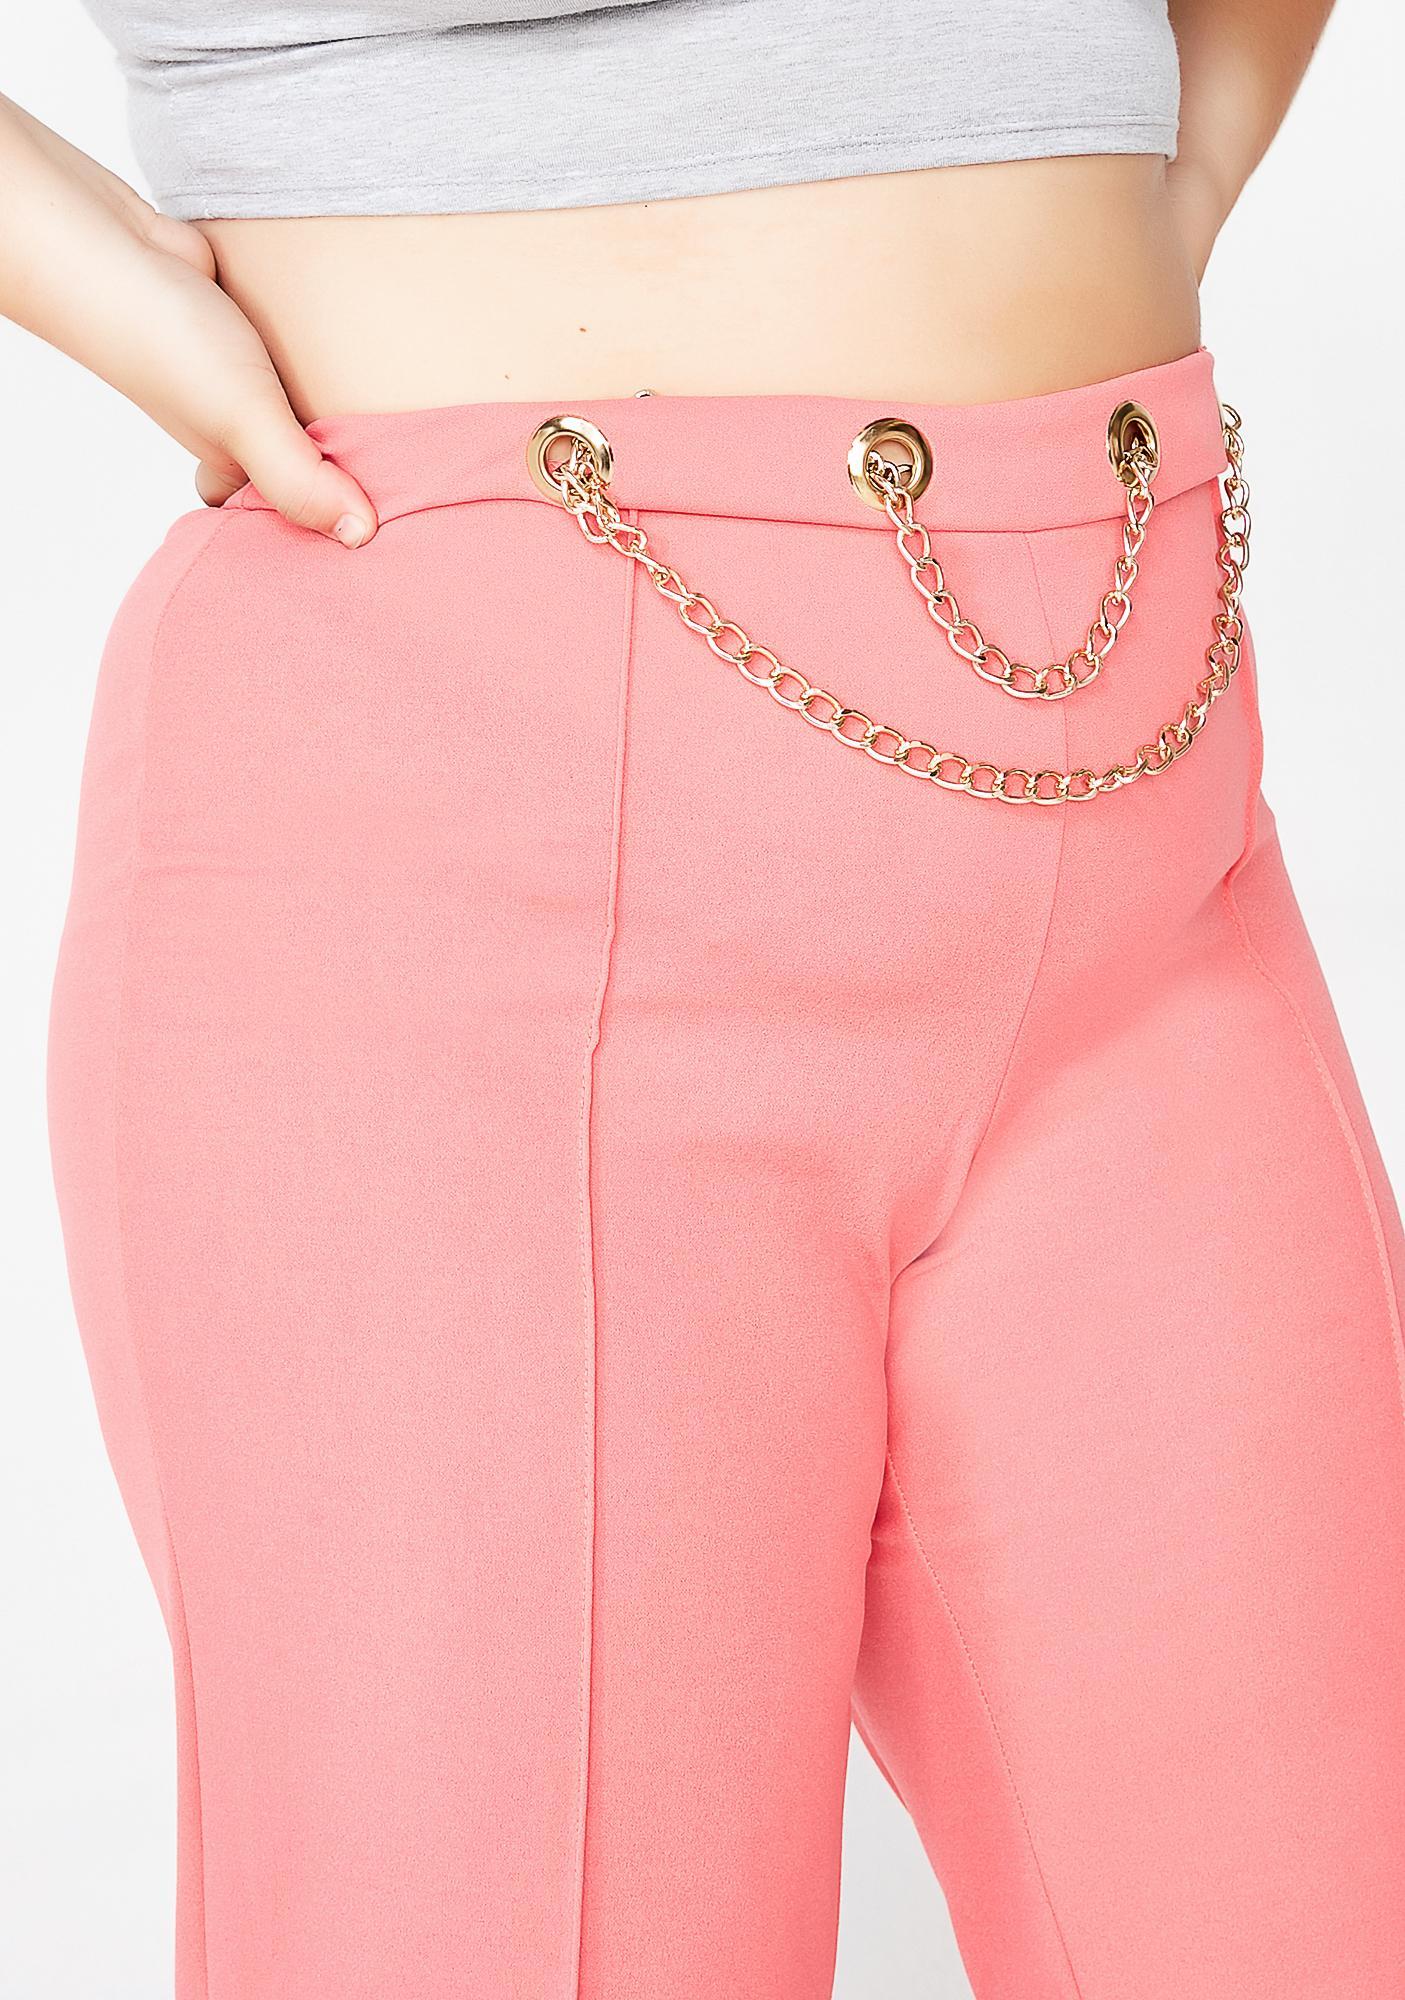 Bubblegum Off The Chain High Waist Pants